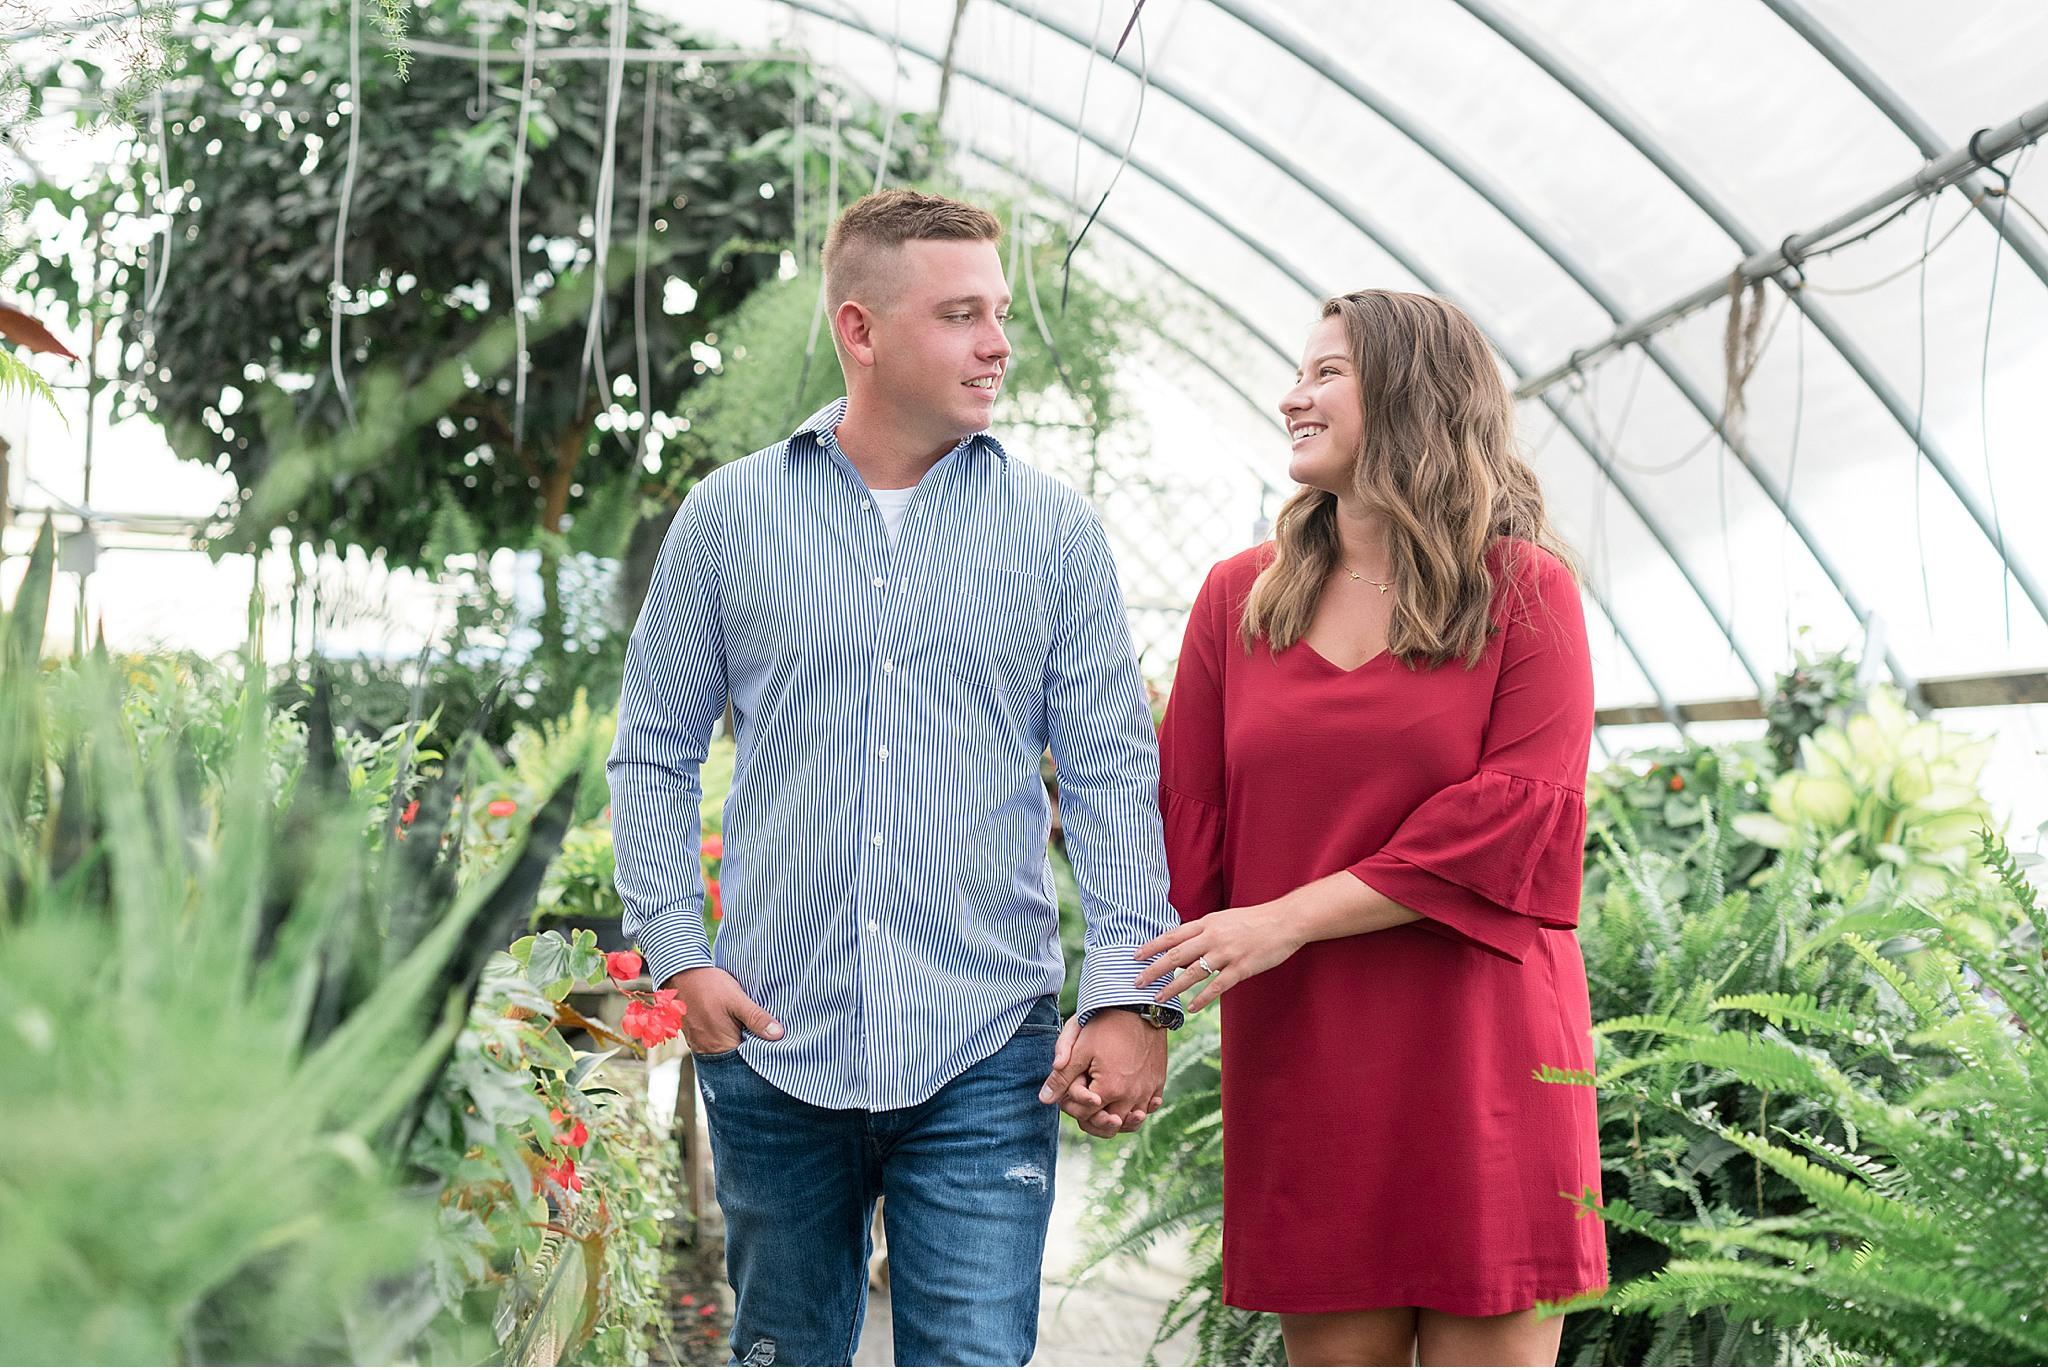 Tudbinks Greenhouse Lancaster PA wedding engagement photography_3955.jpg